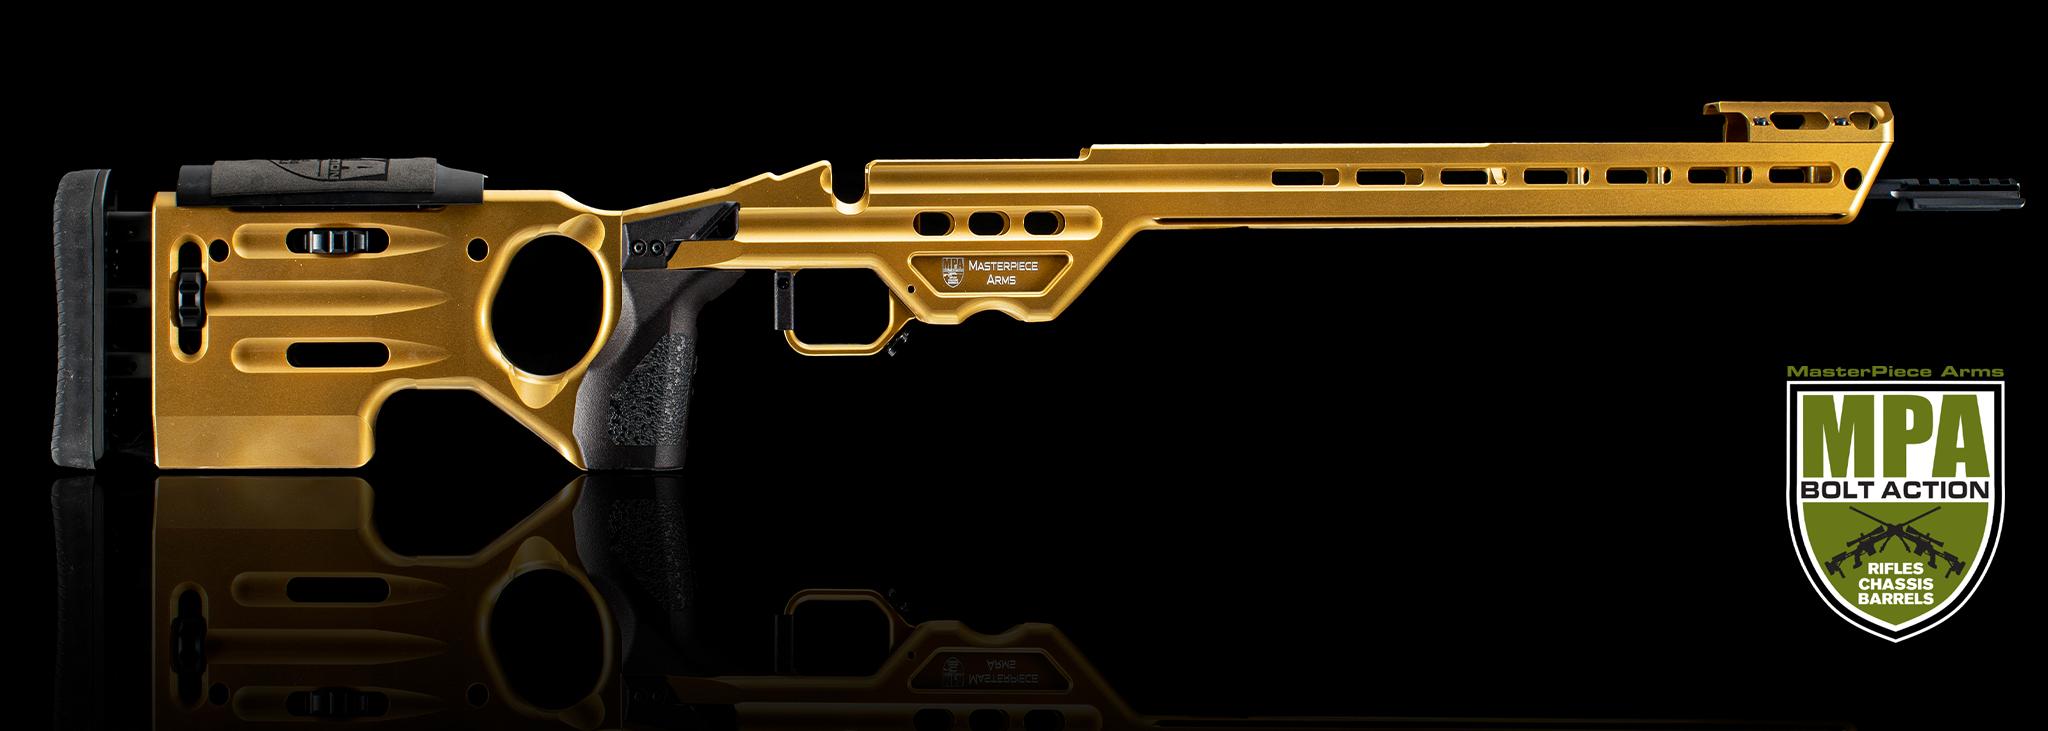 masterpiece-arms-matrix-collection-photo.jpg